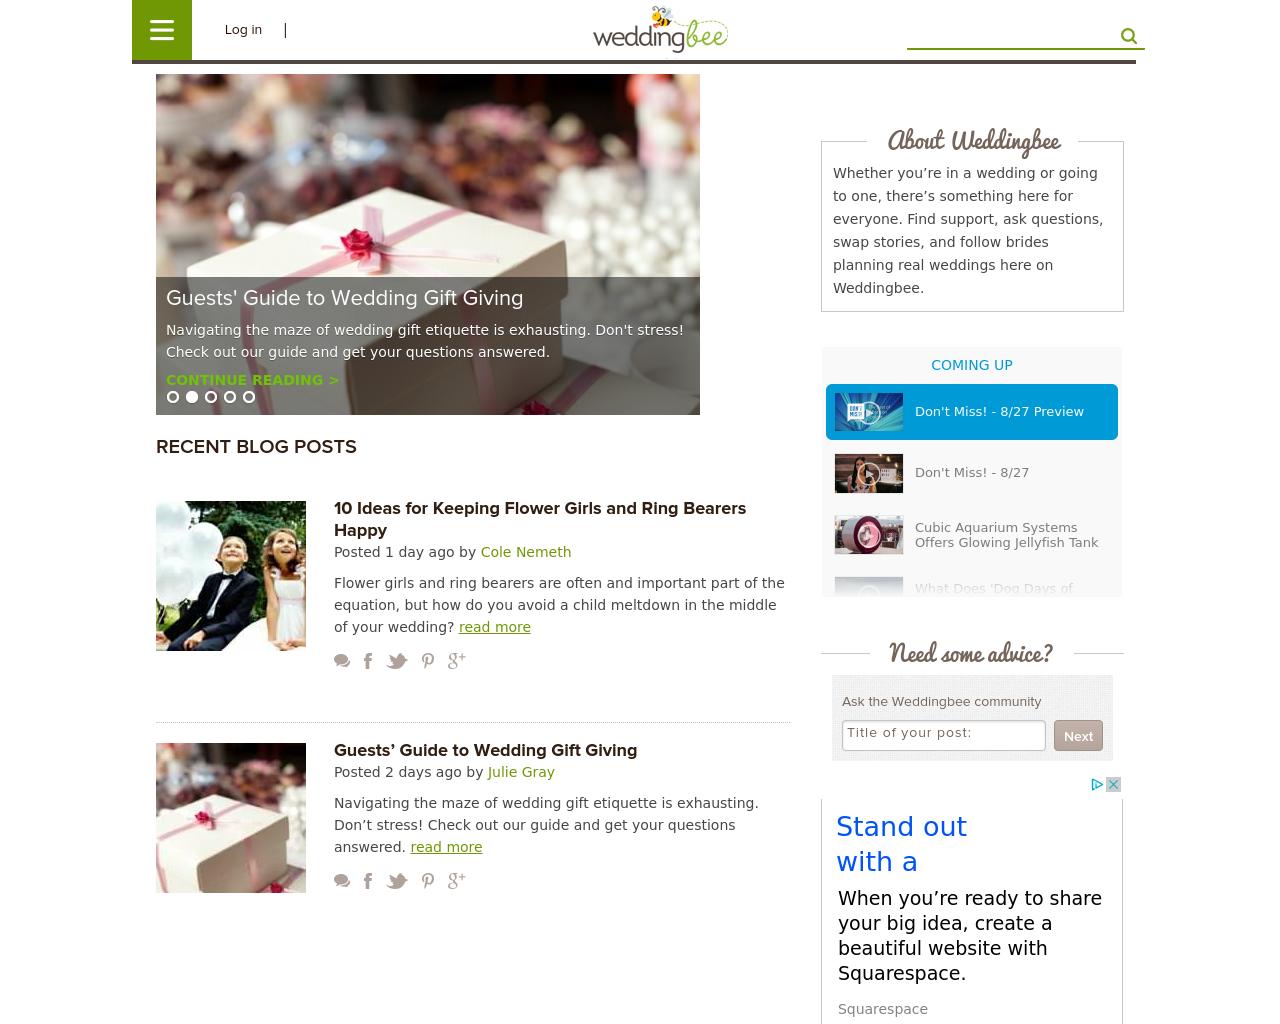 Weddingbee-PRO-Advertising-Reviews-Pricing